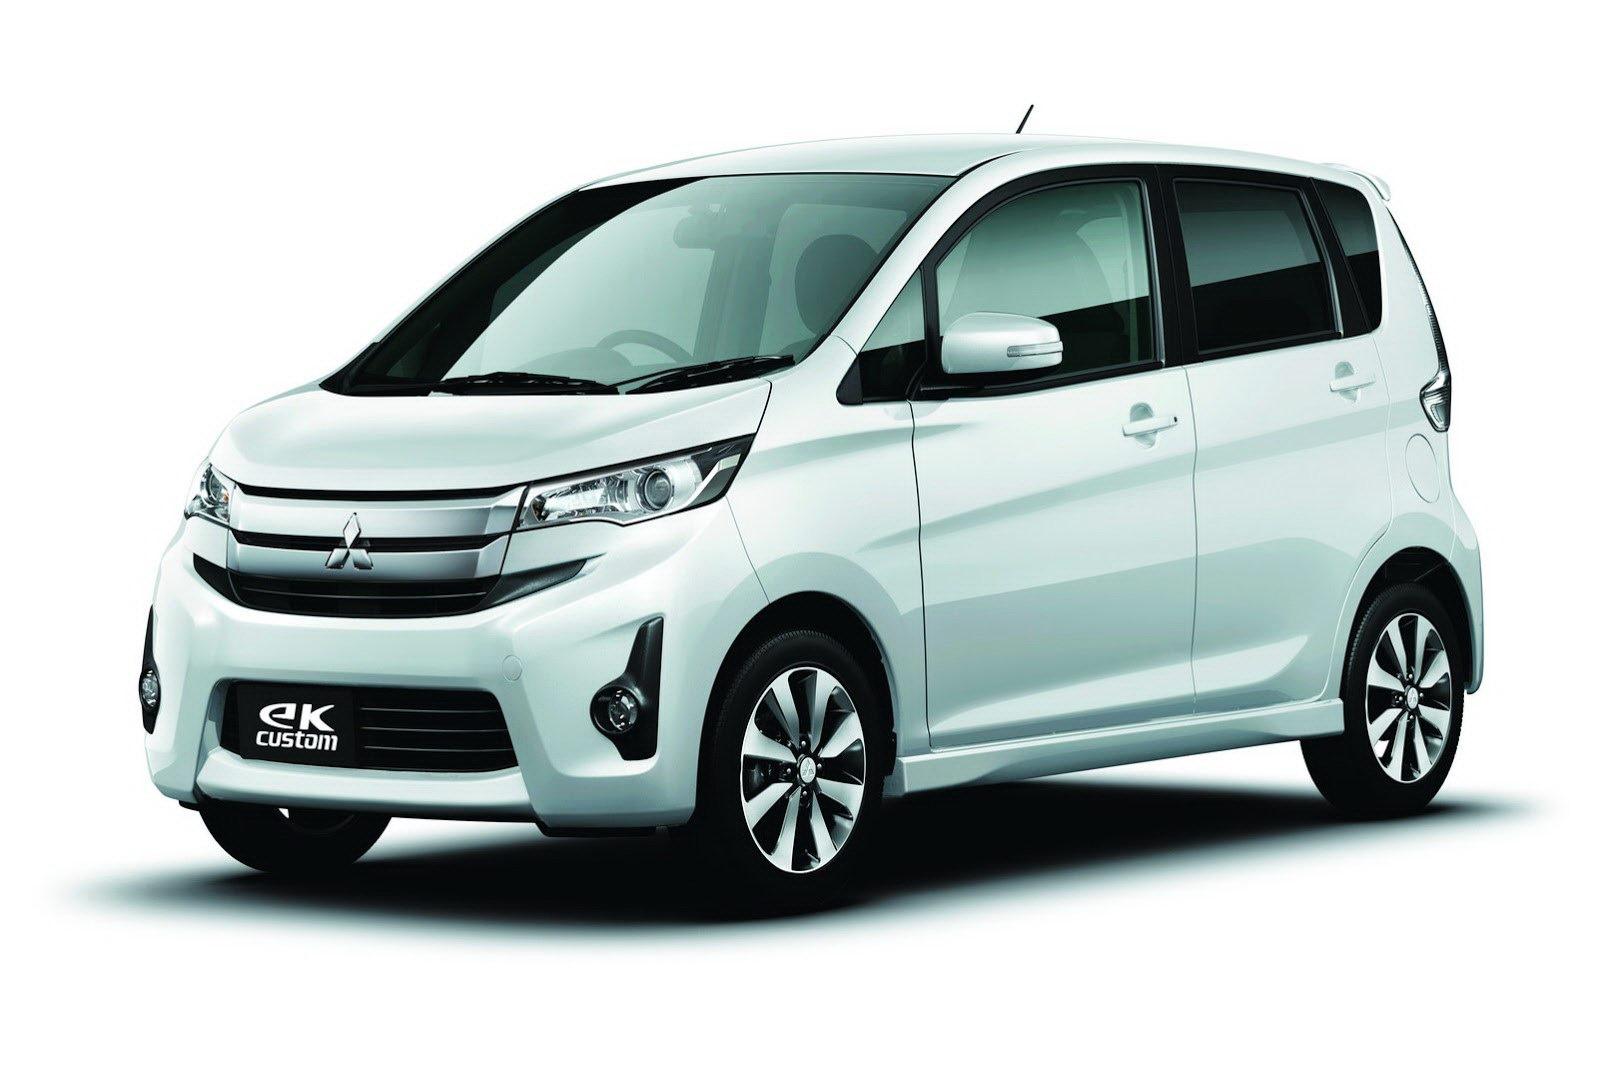 Mitsubishi призналась в занижении паспортного расхода топлива